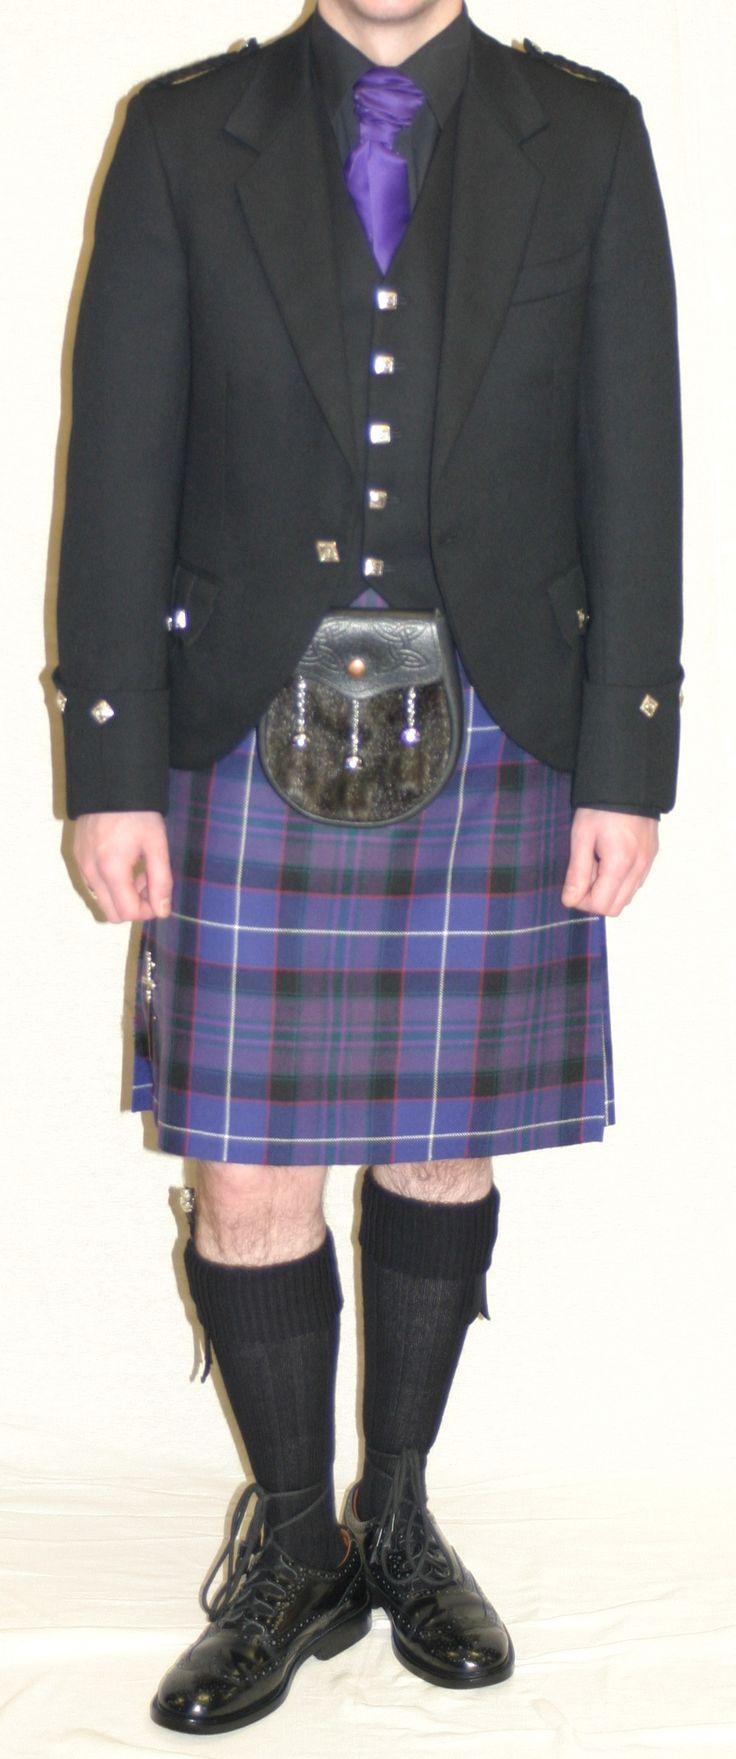 Western Isles kilt with black Argyll jacket & vest